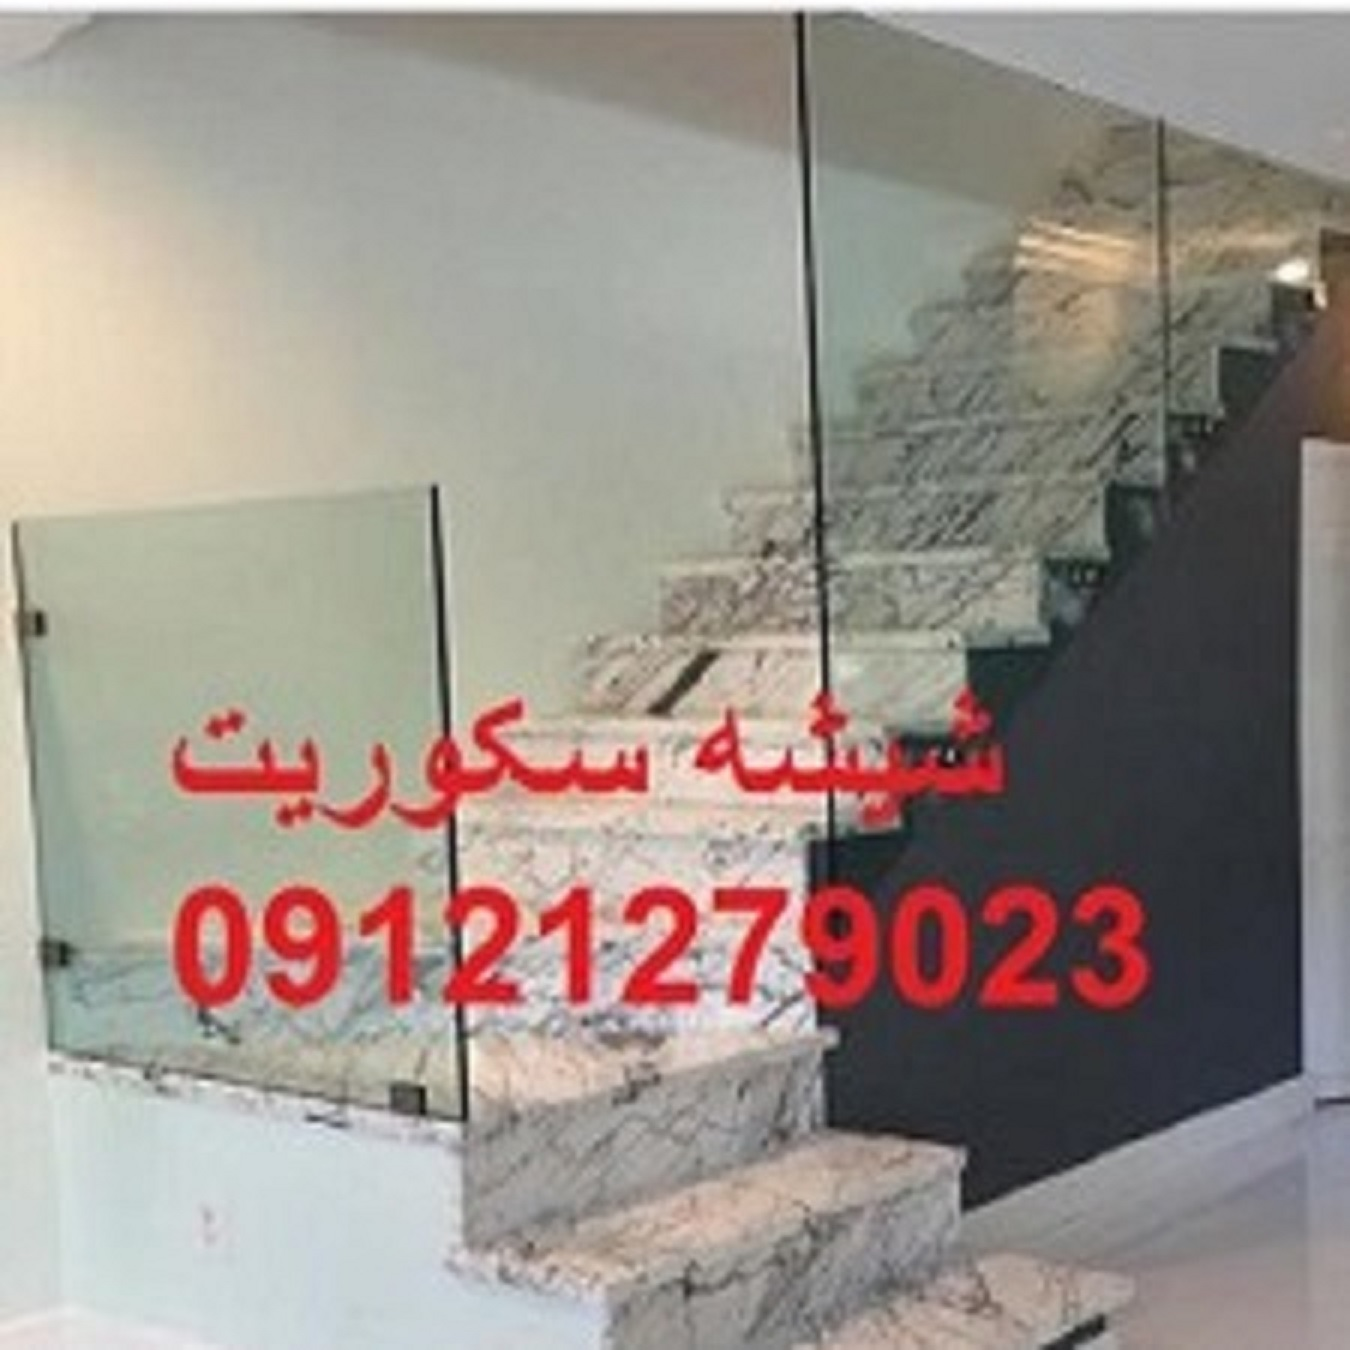 تهران شیشه میرال سکوریت 09121279023